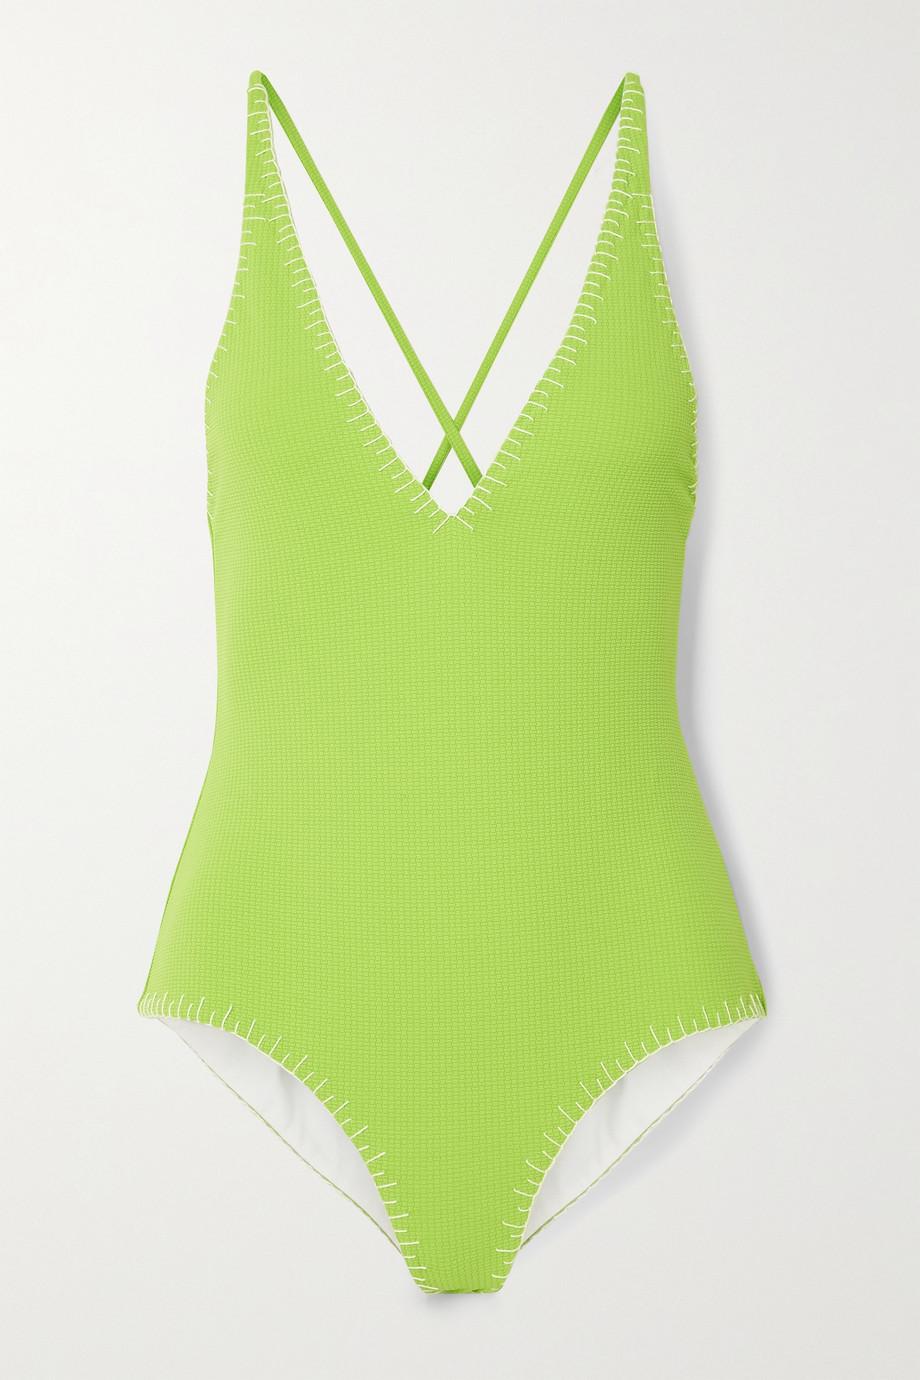 Marysia Sole swimsuit